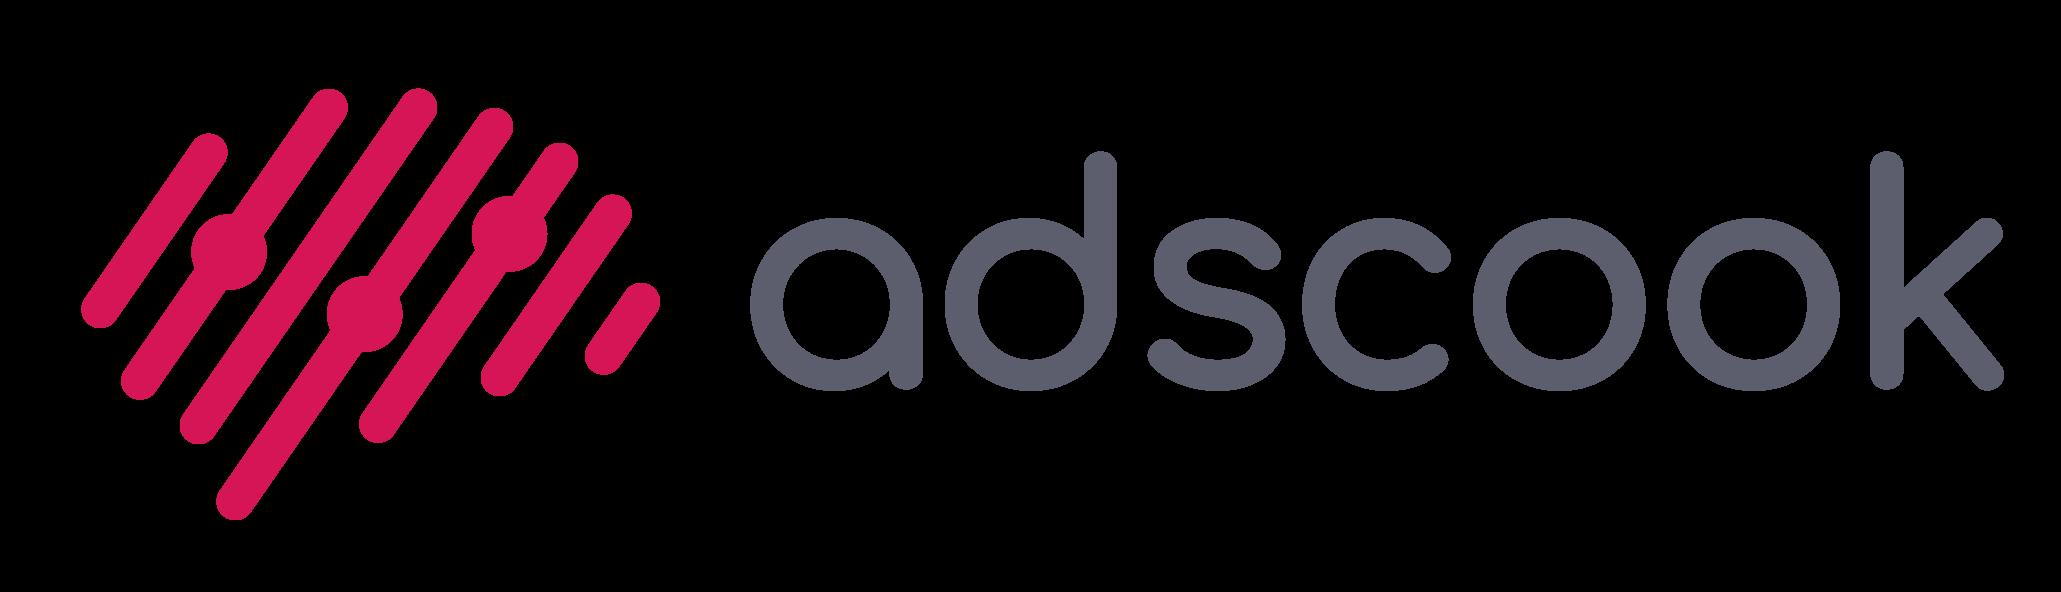 Adscook